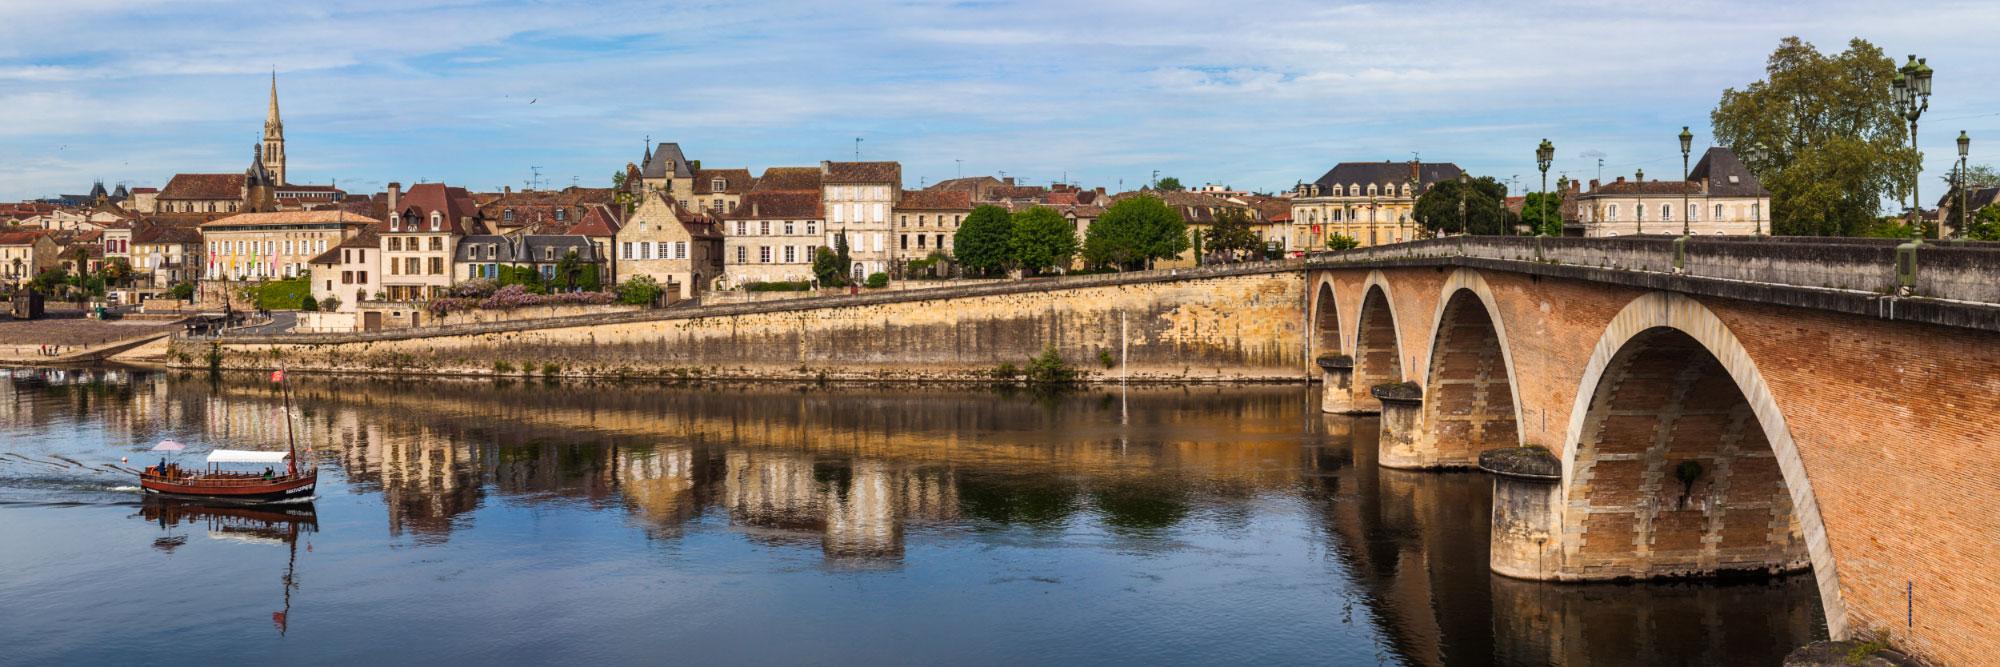 13-14852-france-dordogne-gabarre-sur-la-dordogne-a-bergerac-panorama-sentucq-h